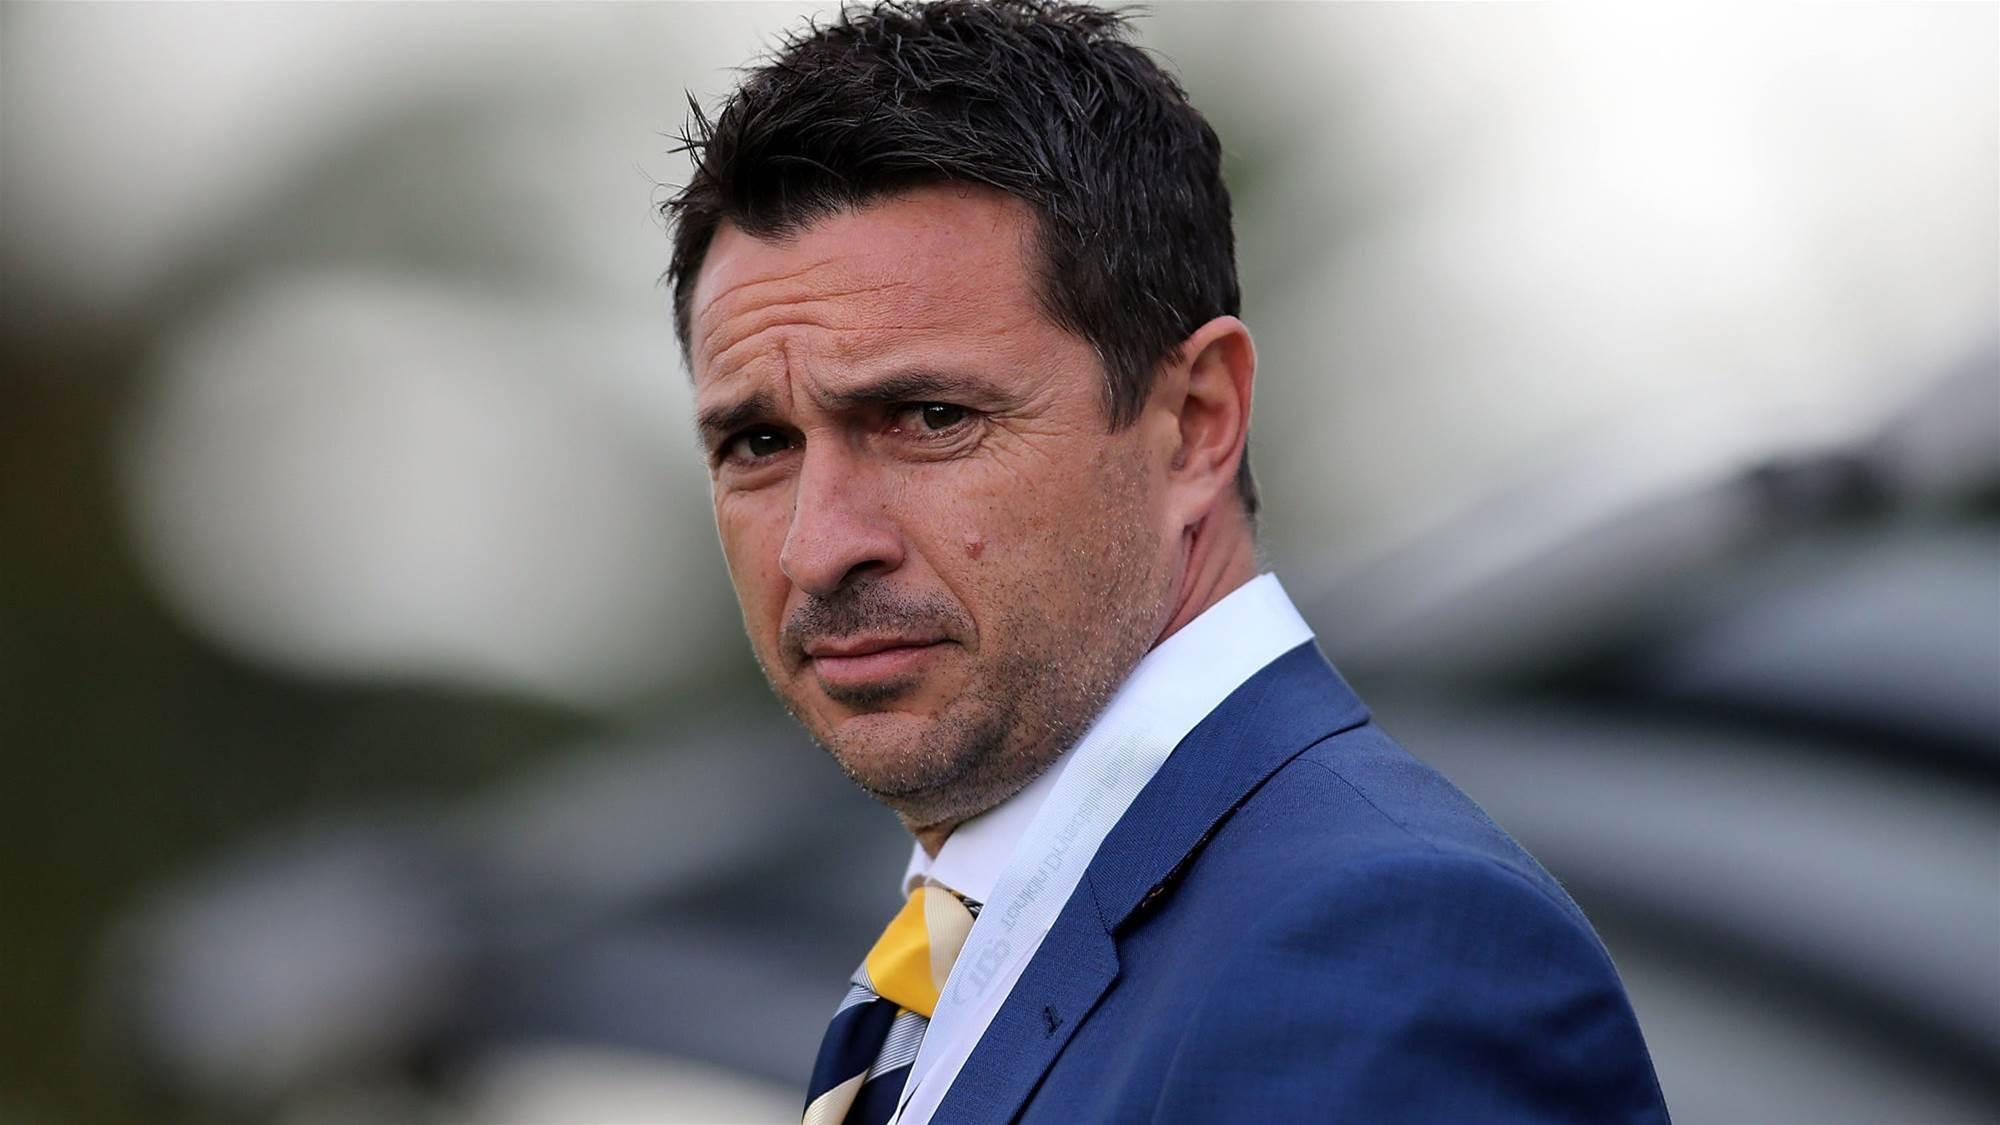 Okon: The gap is massive between NPL and A-League